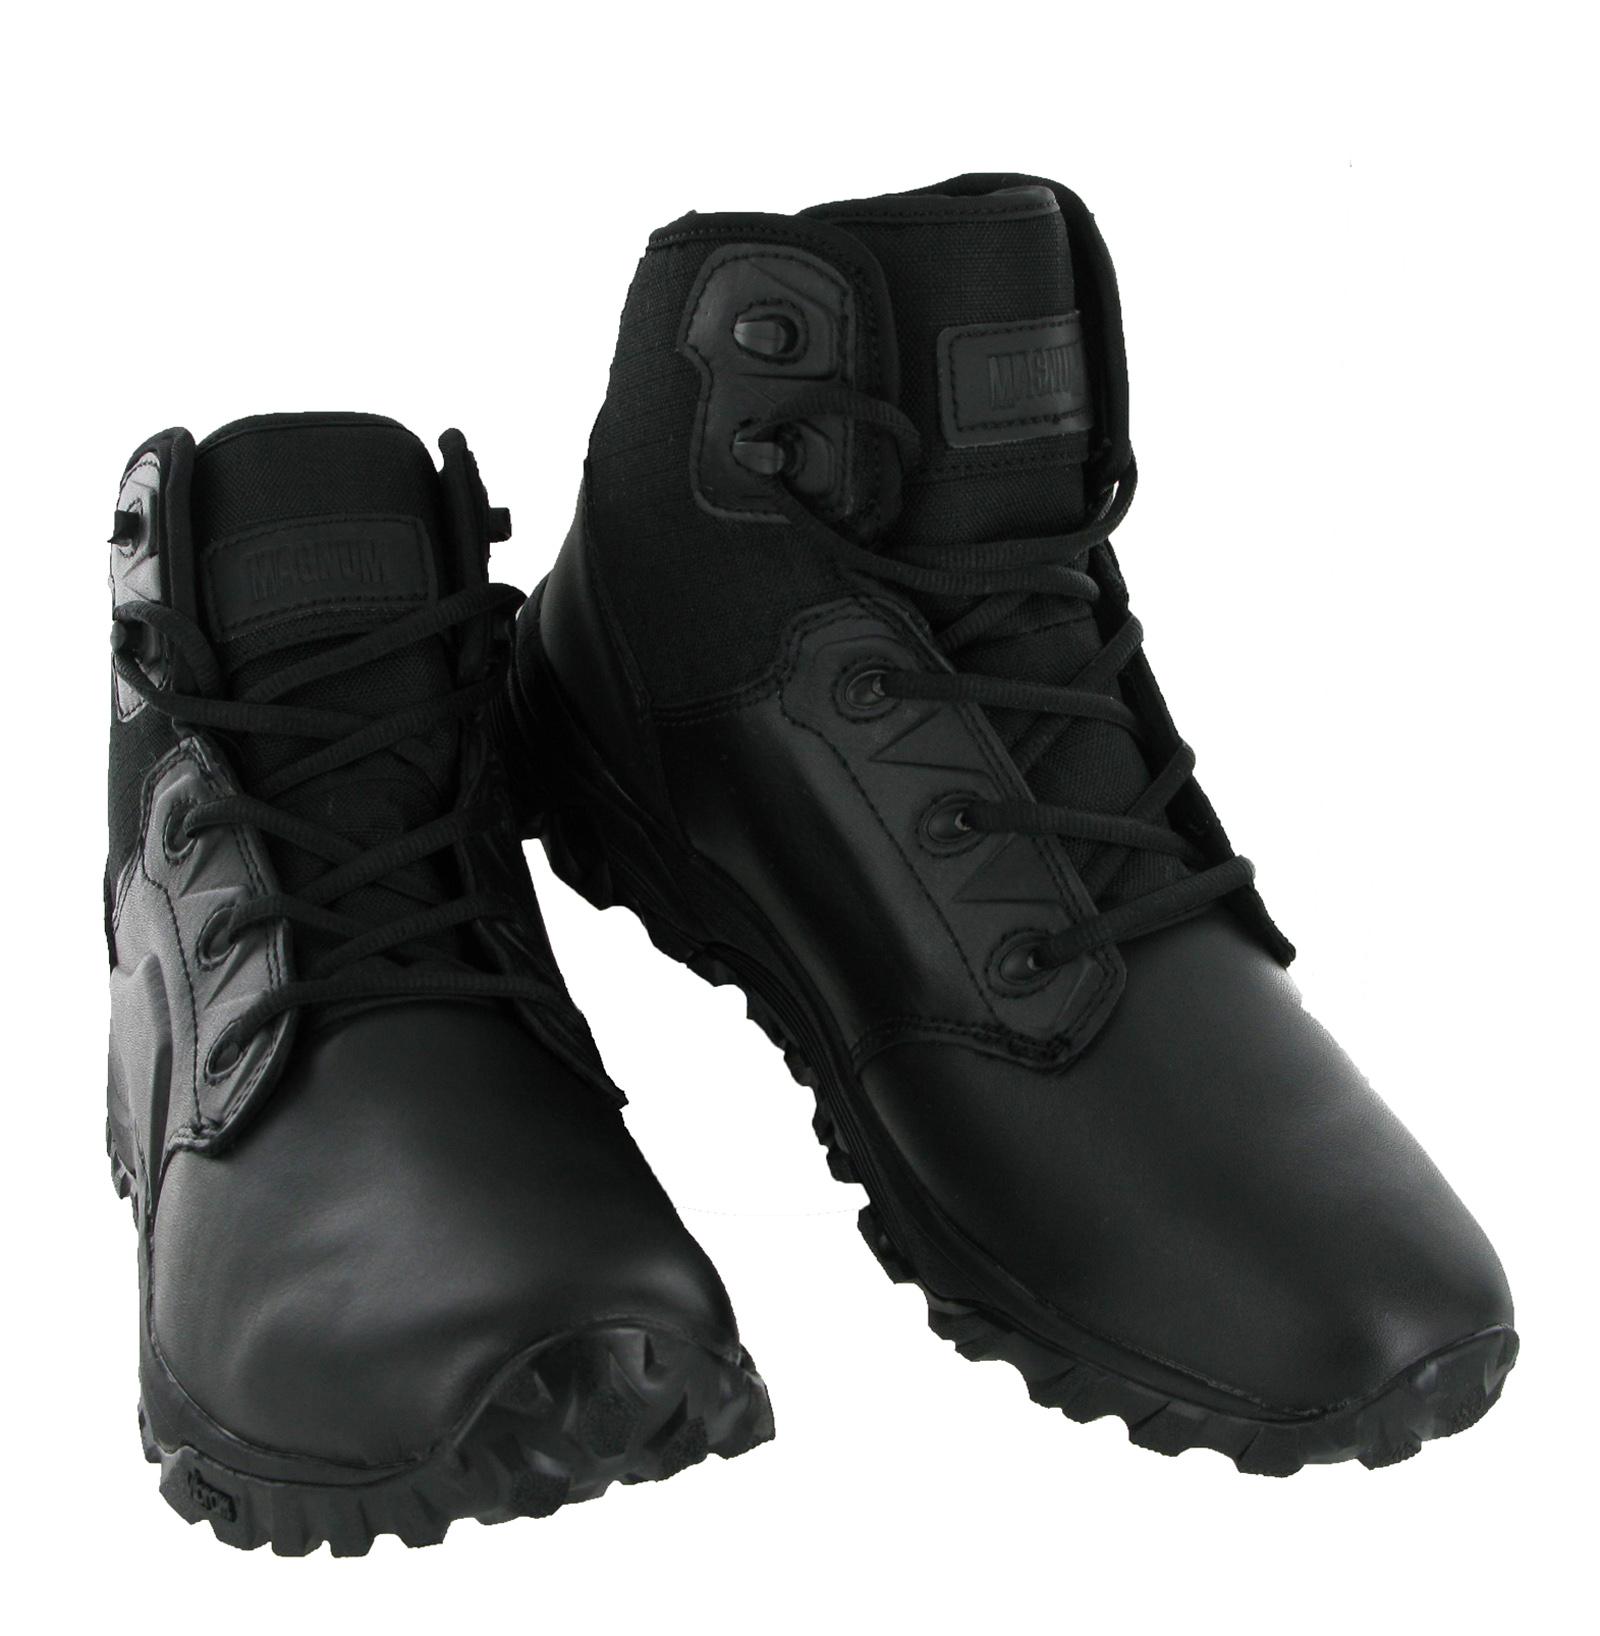 New Mens Magnum MACH 2 5.0 Black Lightweight Combat Police ...